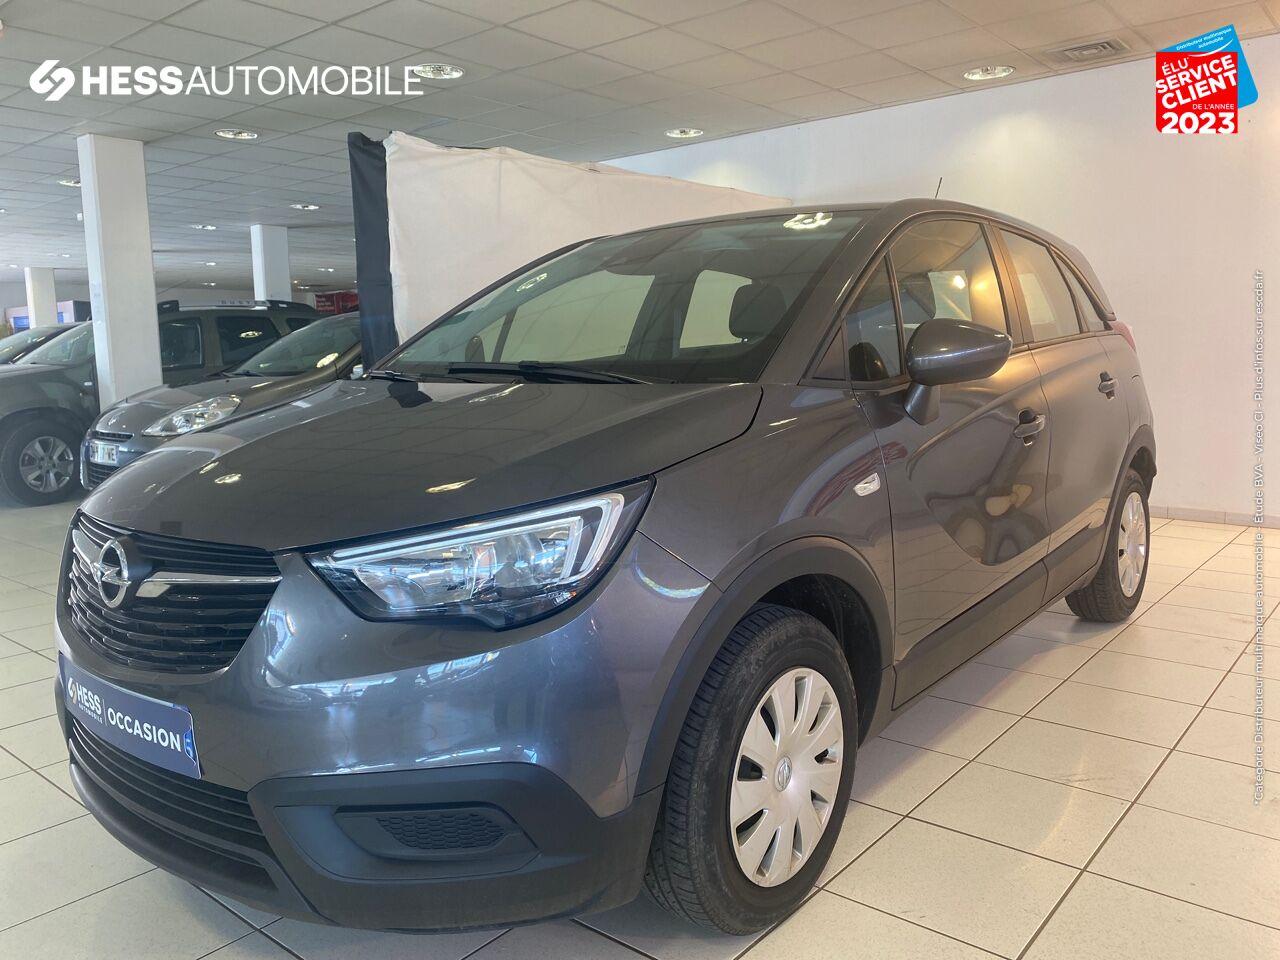 chez Opel Besançon